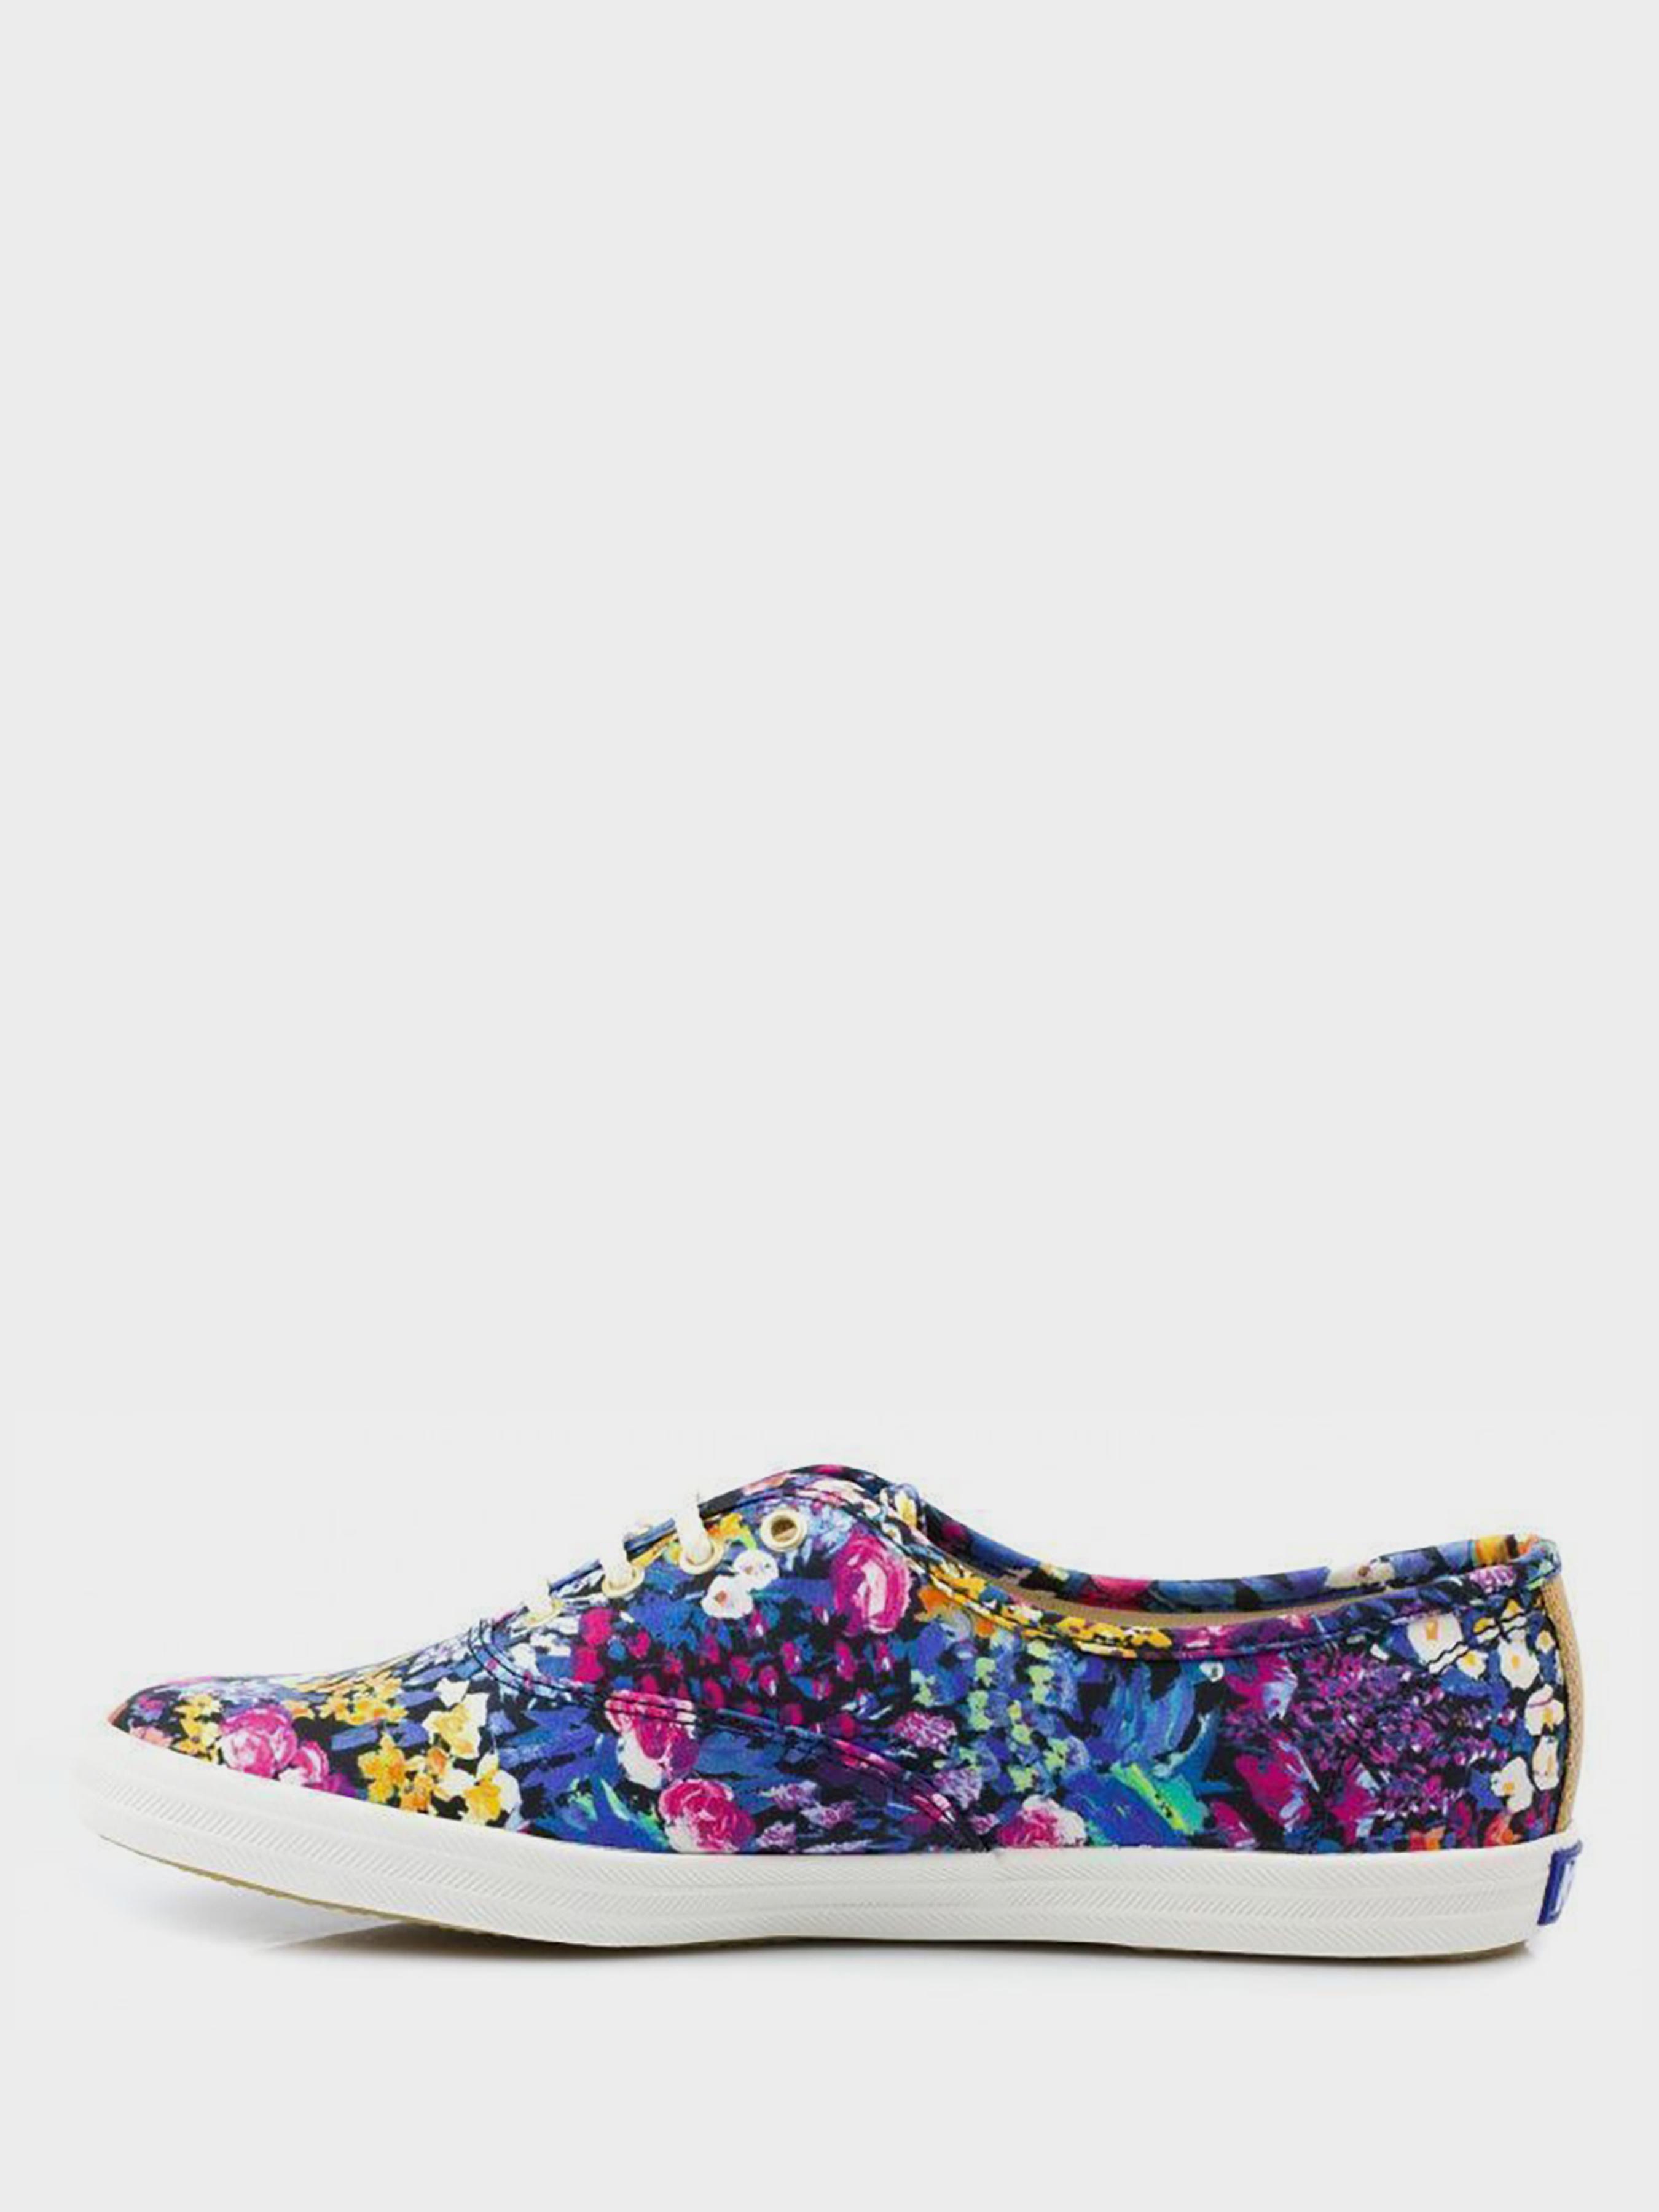 Кеды женские KEDS CH LIBERTY FLORAL KD226 размеры обуви, 2017